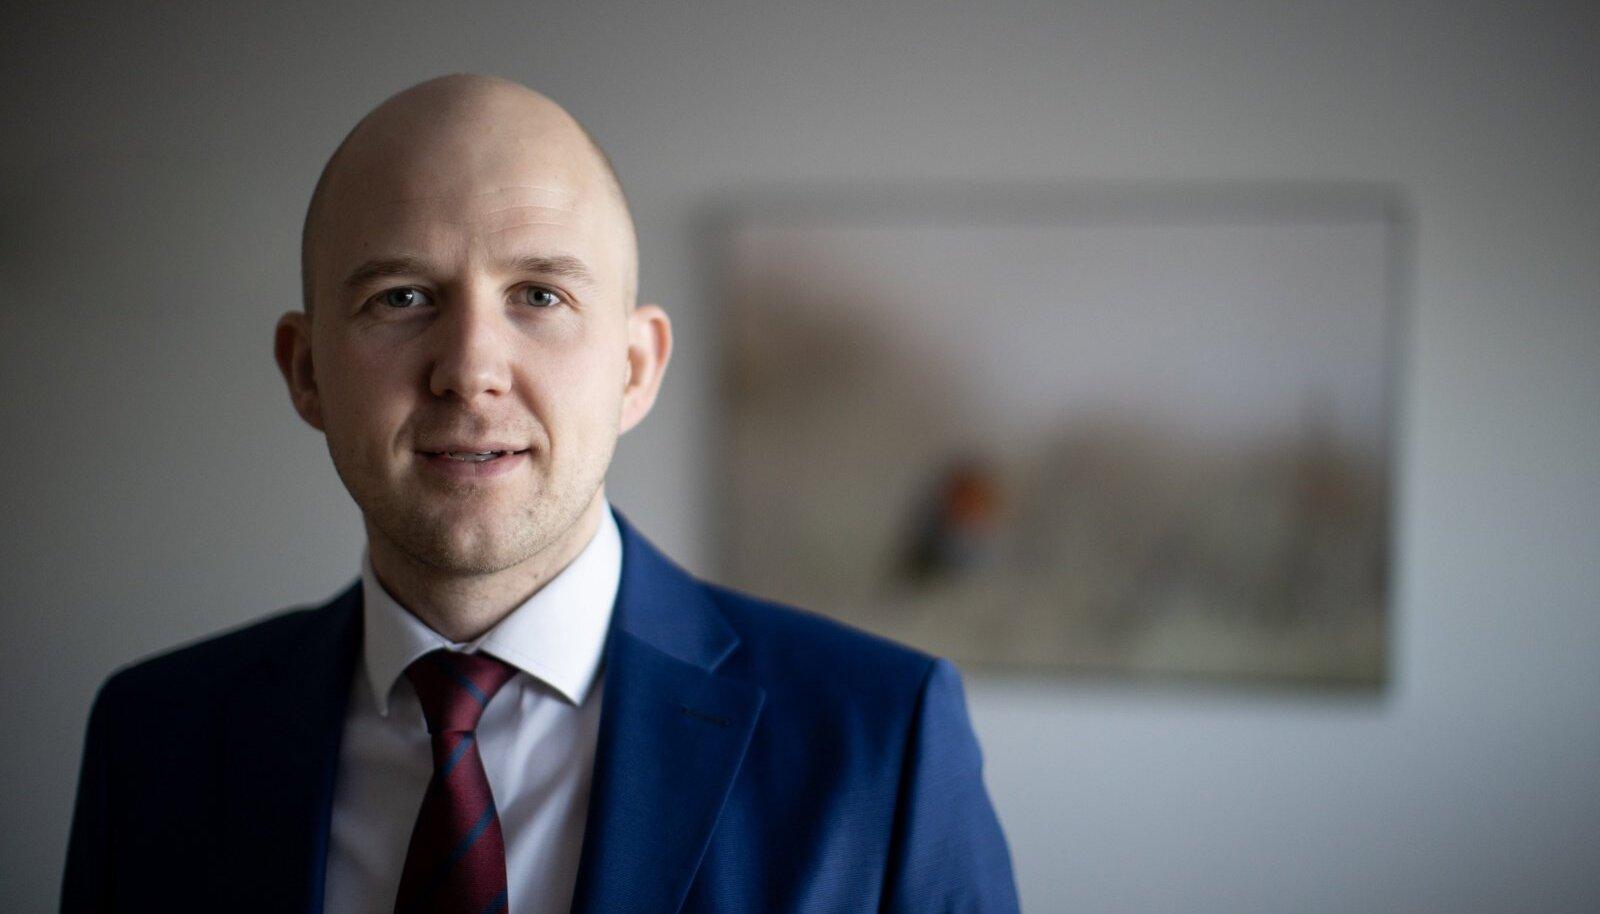 Keskkonnaminister Tõnis Mölder